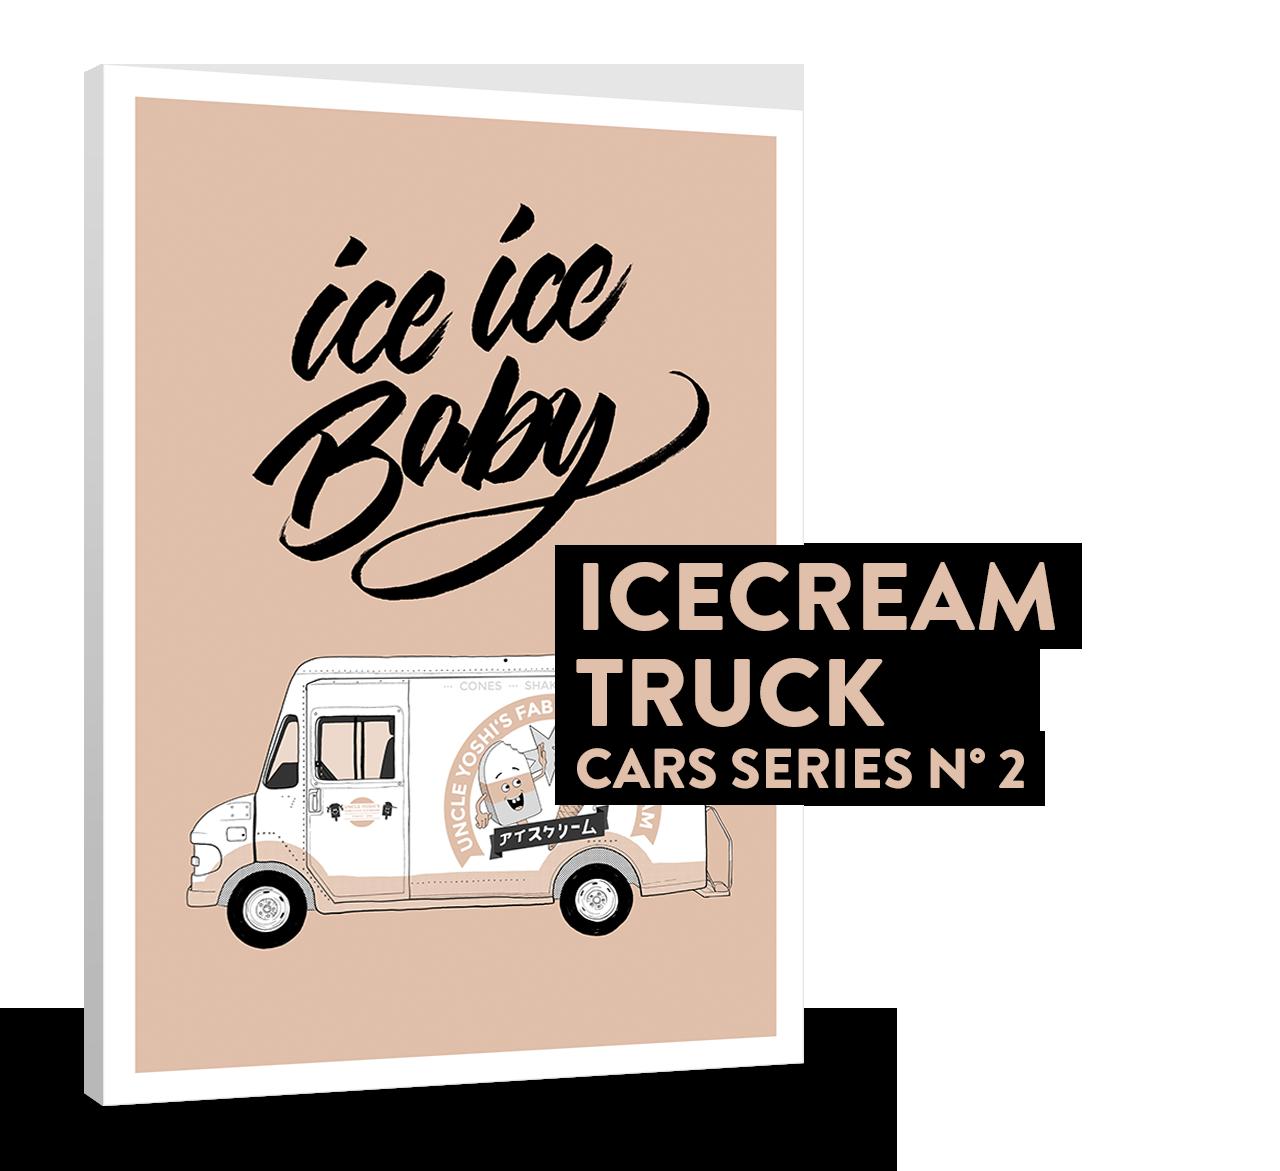 ICECREAM TRUCK (CARS SERIES N°2)